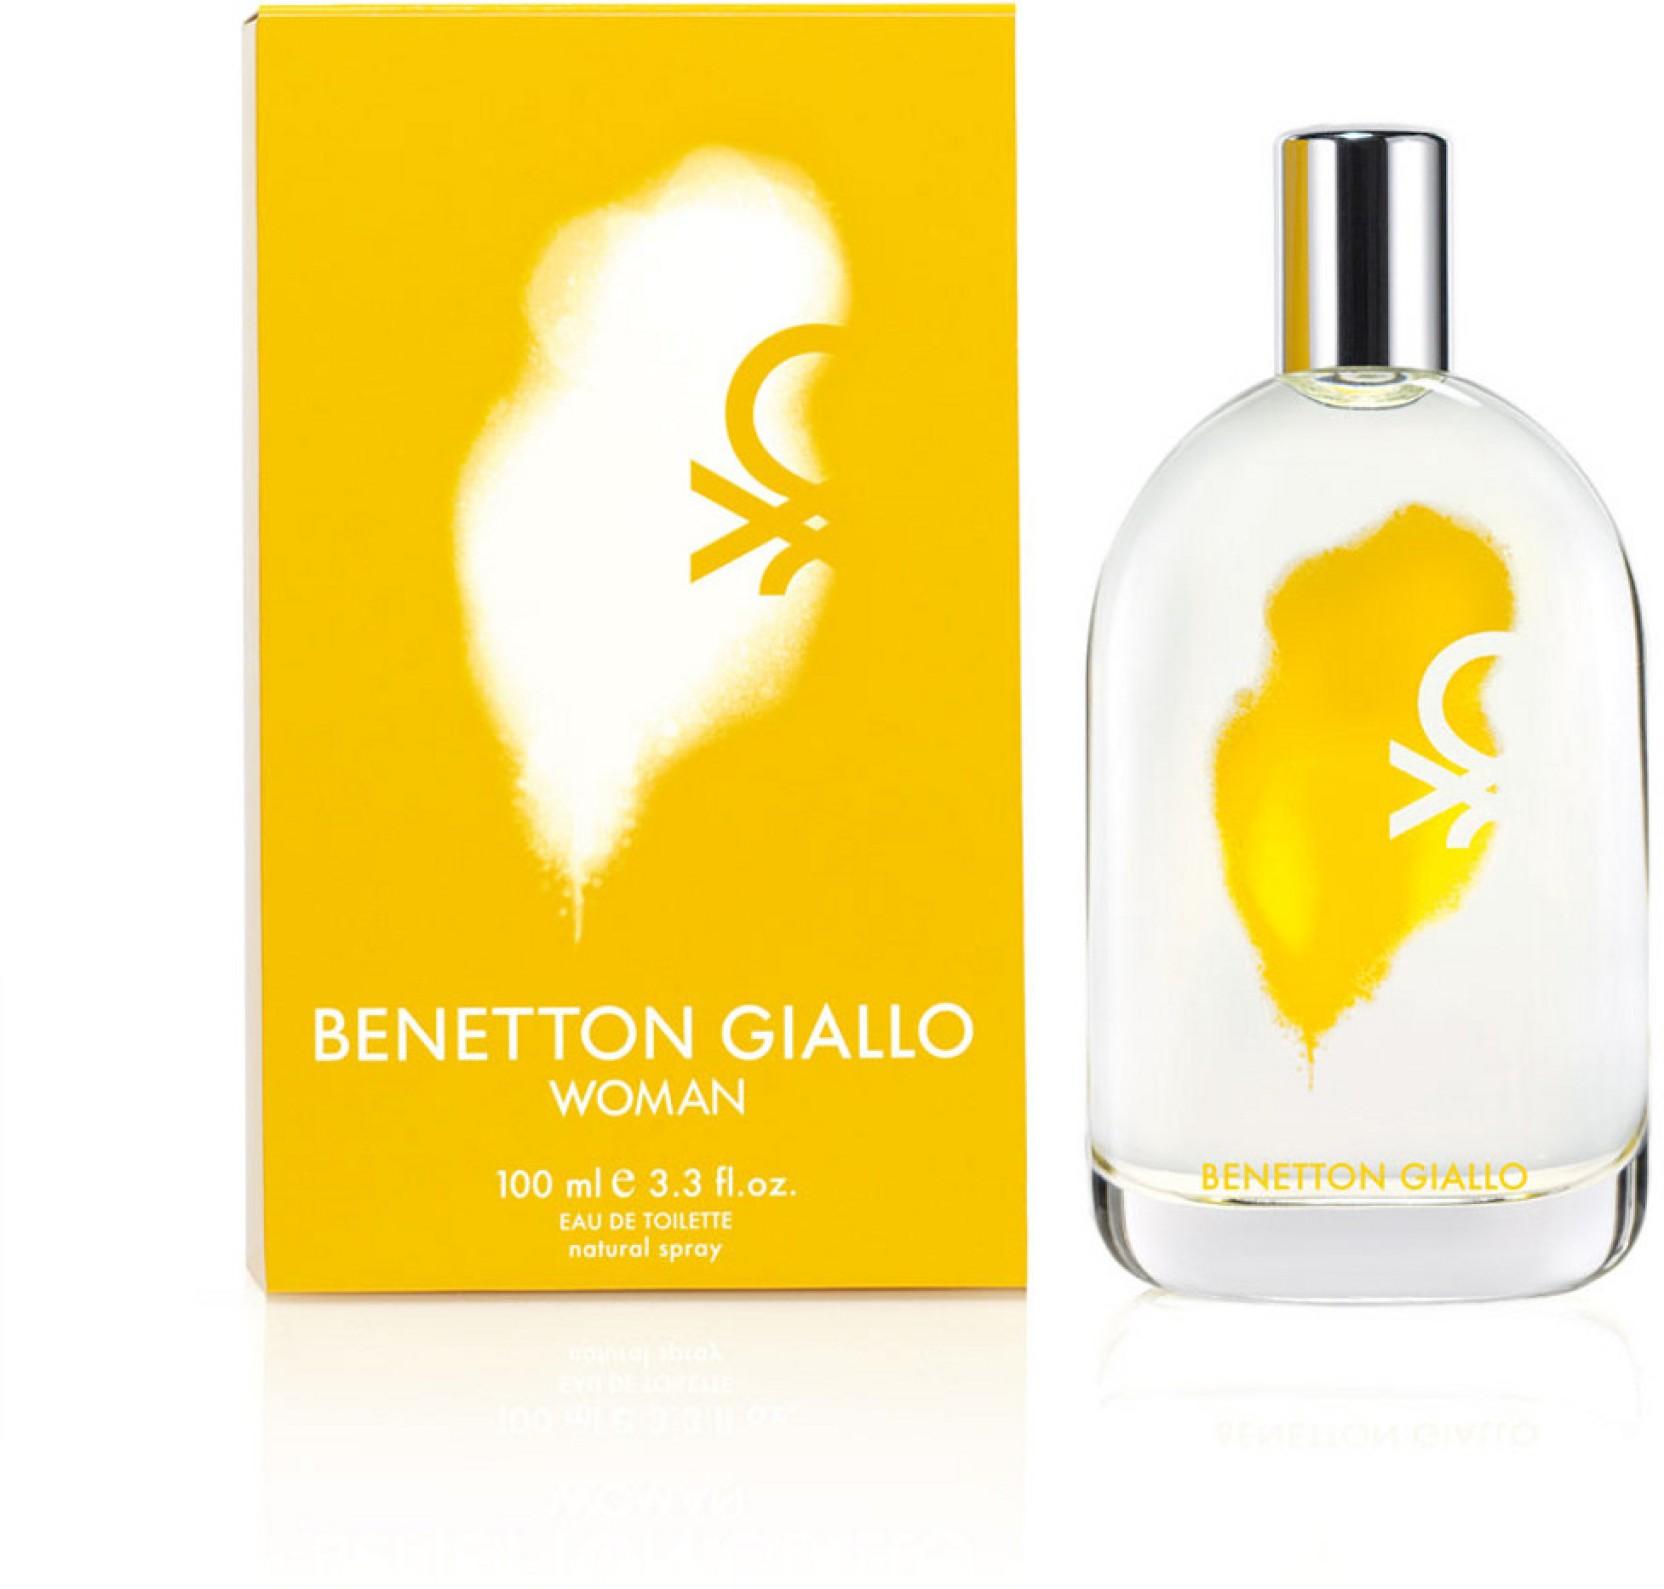 Buy Benetton Giallo Edt 100 Ml Online In India B United Jeans Man Parfum 100ml Original Home